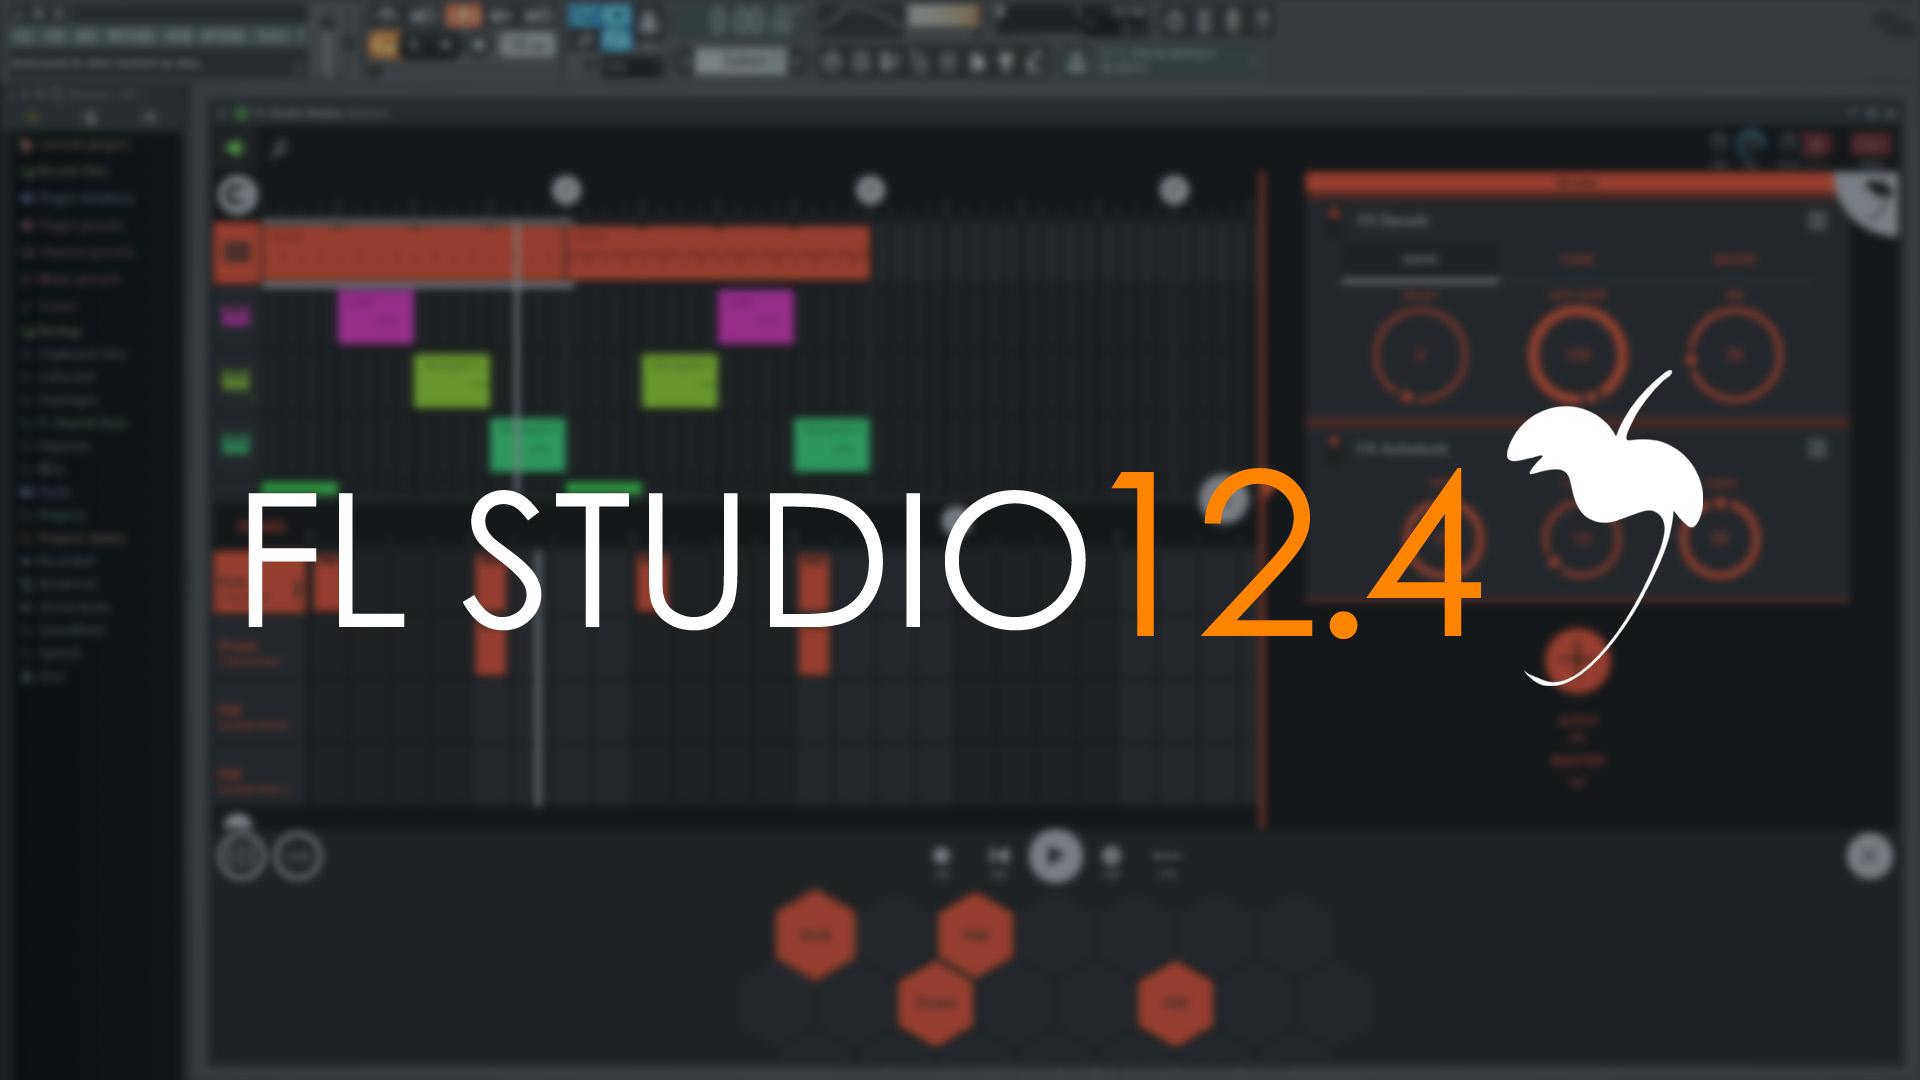 fl studio 12.4 register key